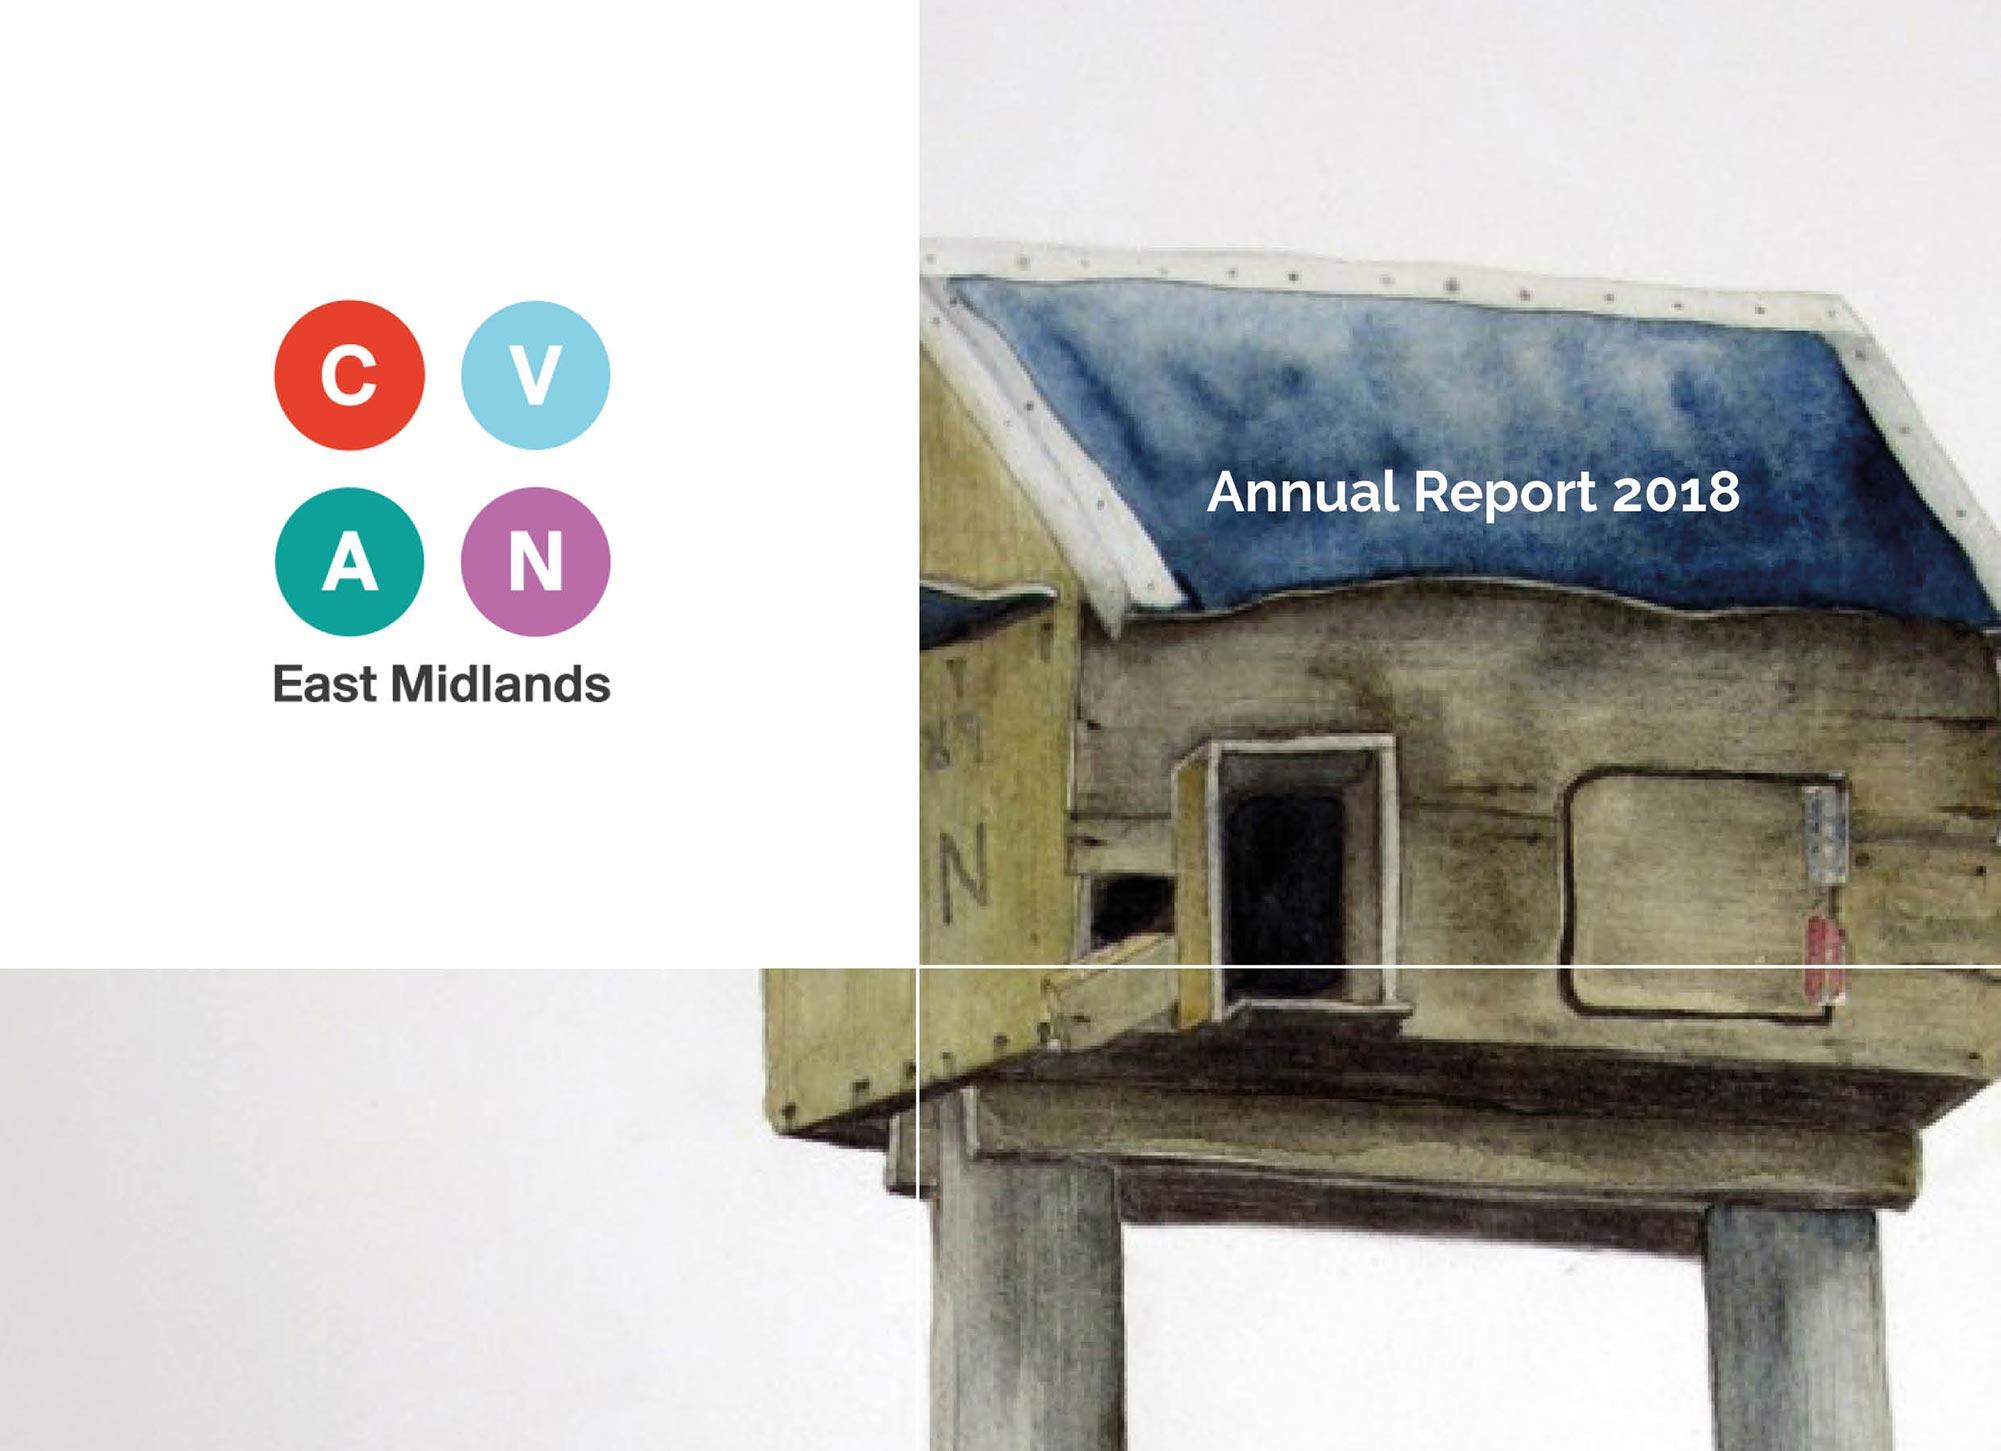 CVAN EM Annual Report 2018